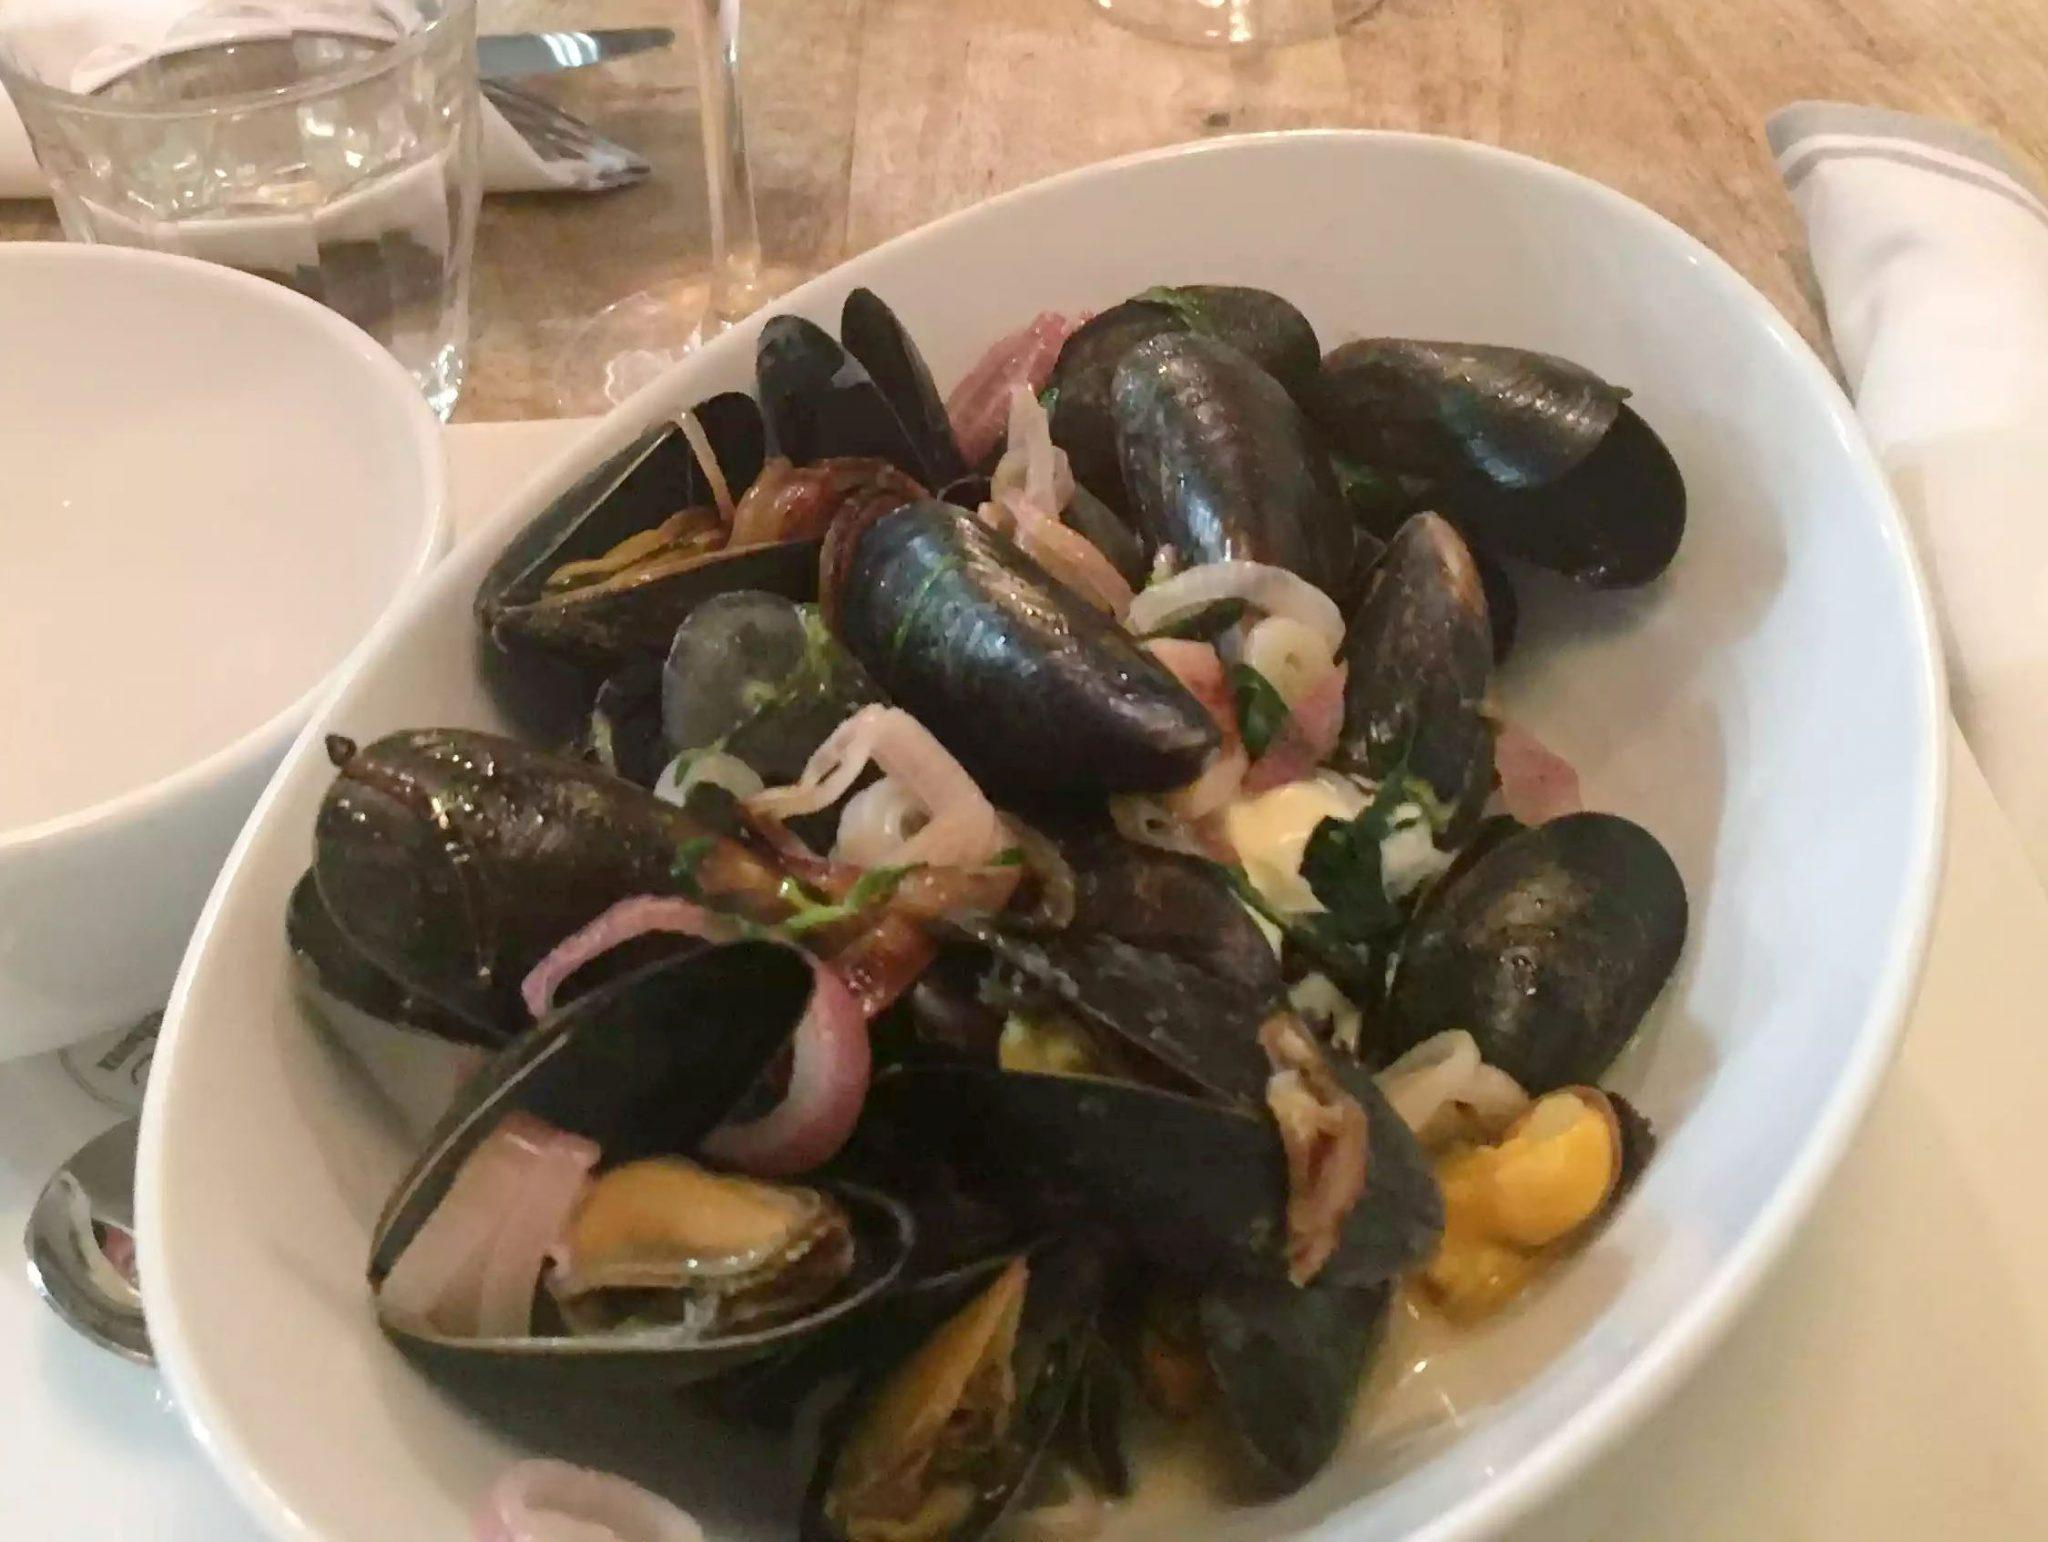 Lure Fish Kitchen North London Kentish Town Seafood Restaurant mussels Tarragon Cream